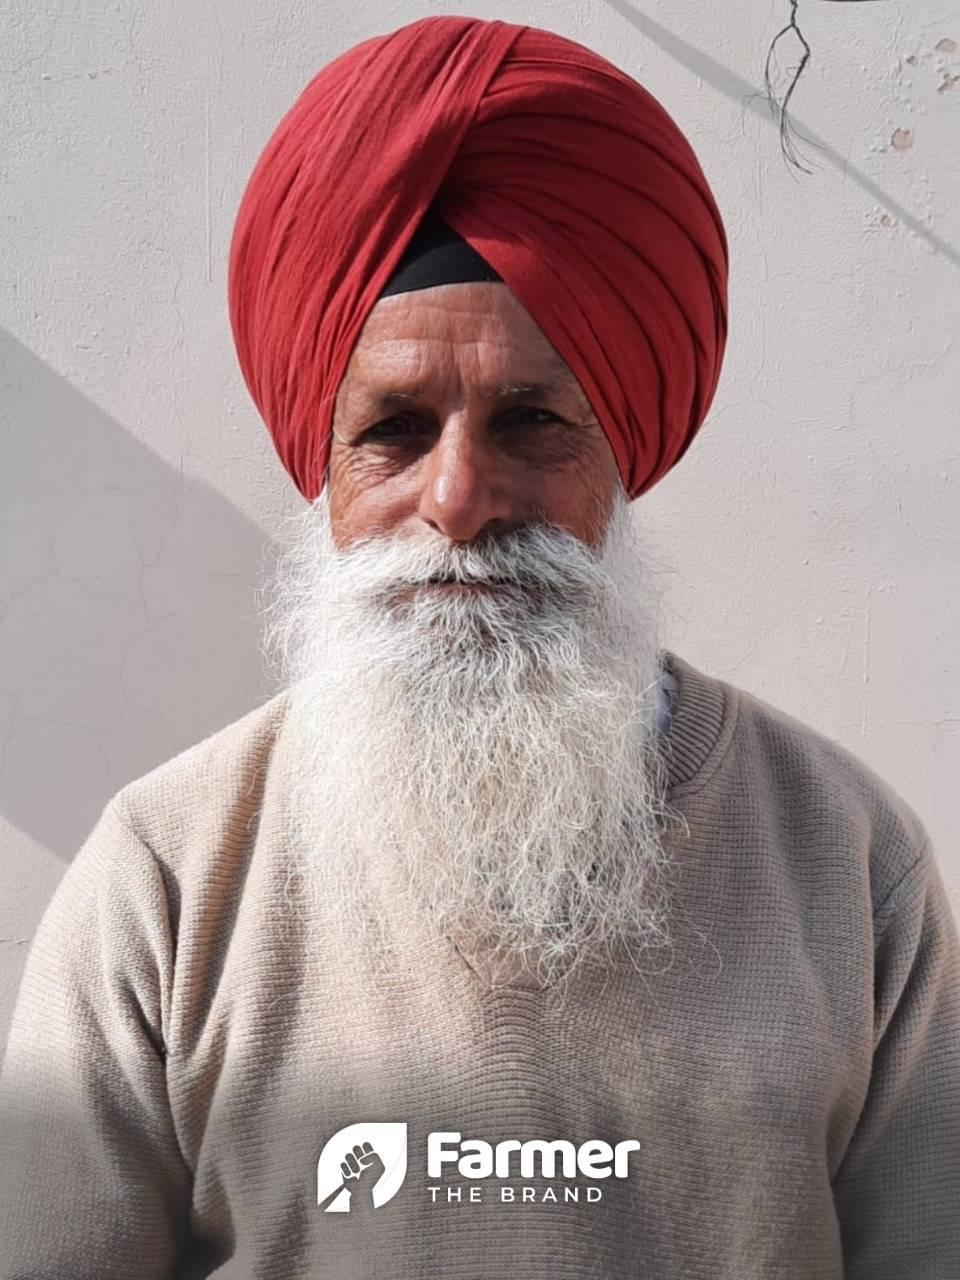 Ajit Singh Aujla